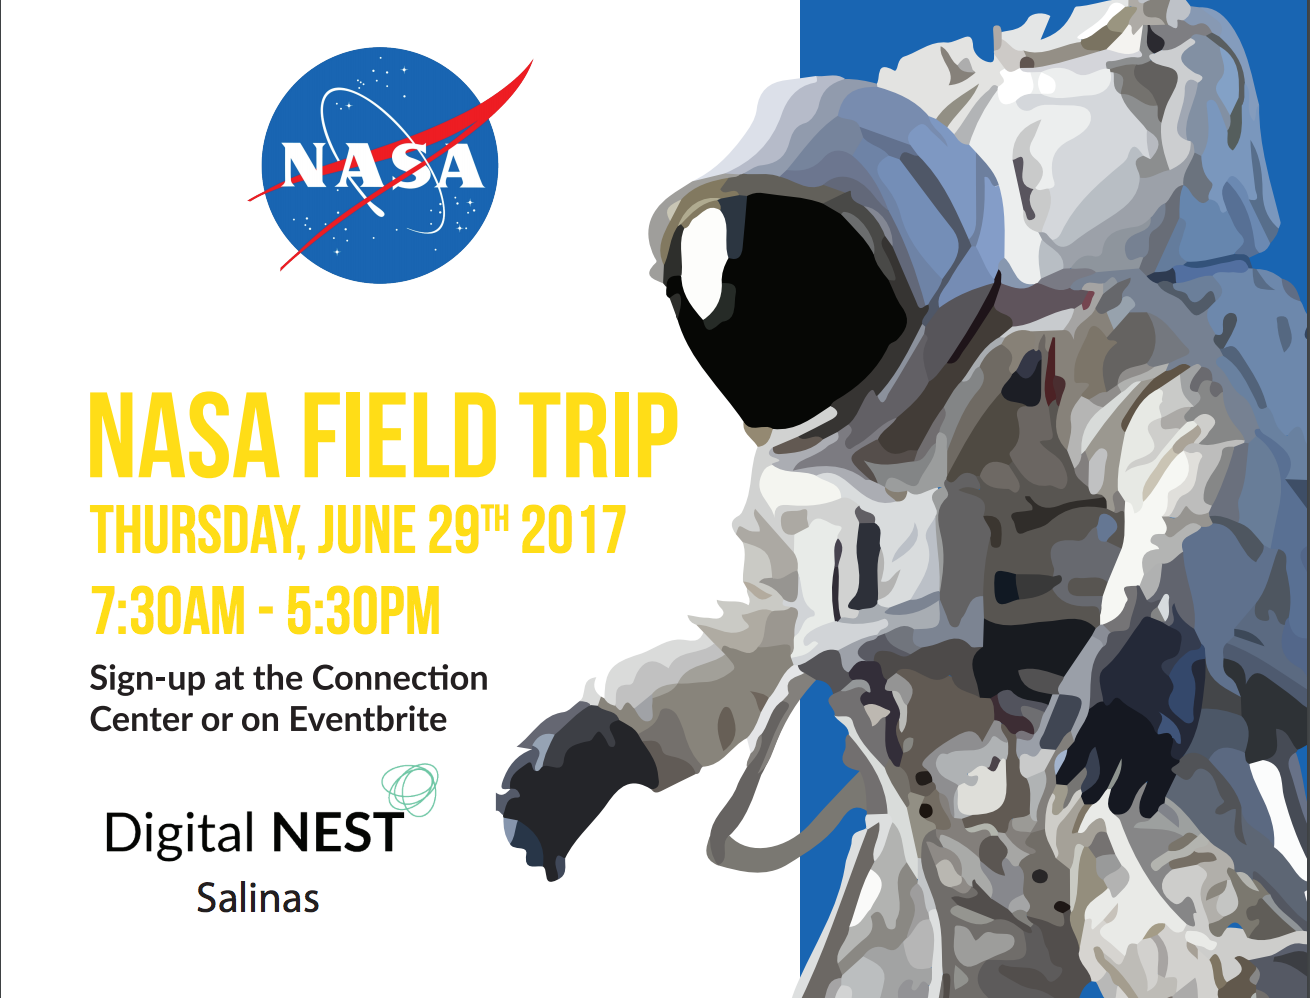 Digital NEST Salinas @ NASA